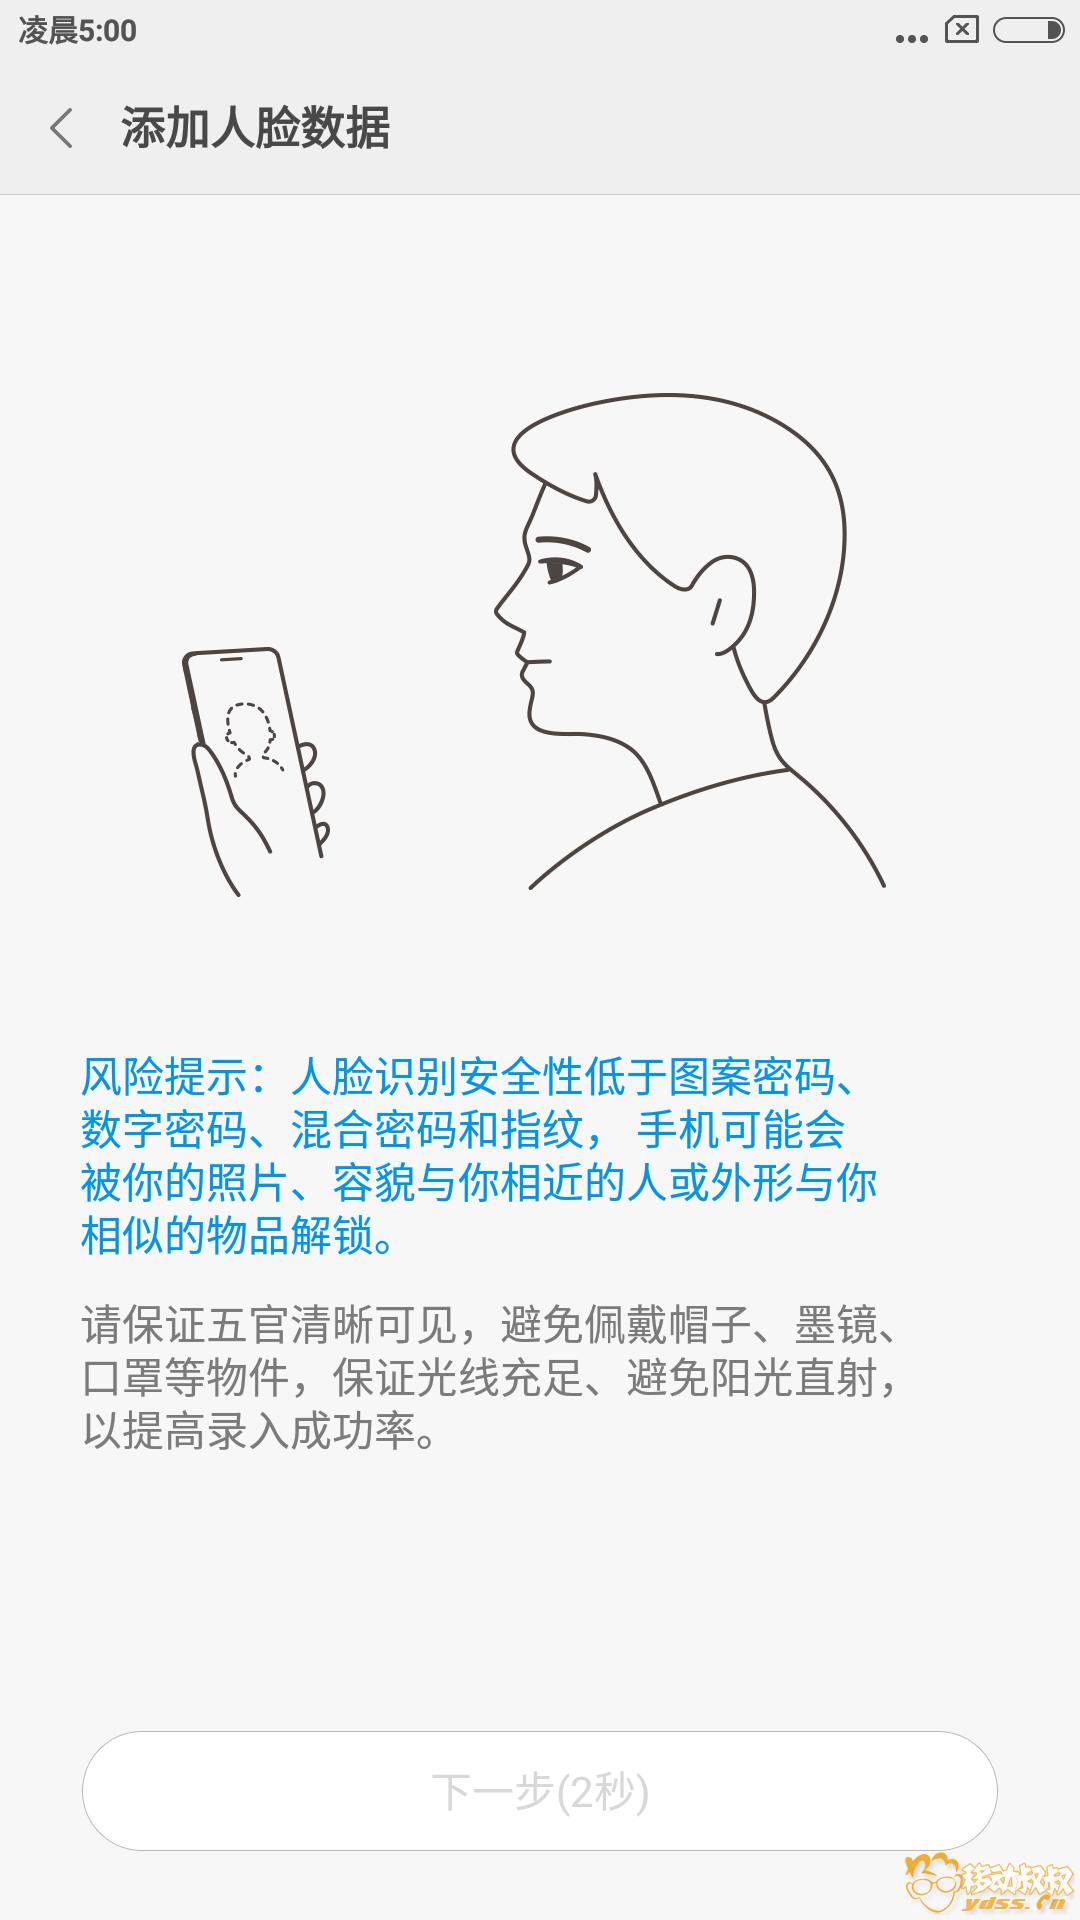 Screenshot_2018-03-12-05-00-18-302_com.android.keyguard.png